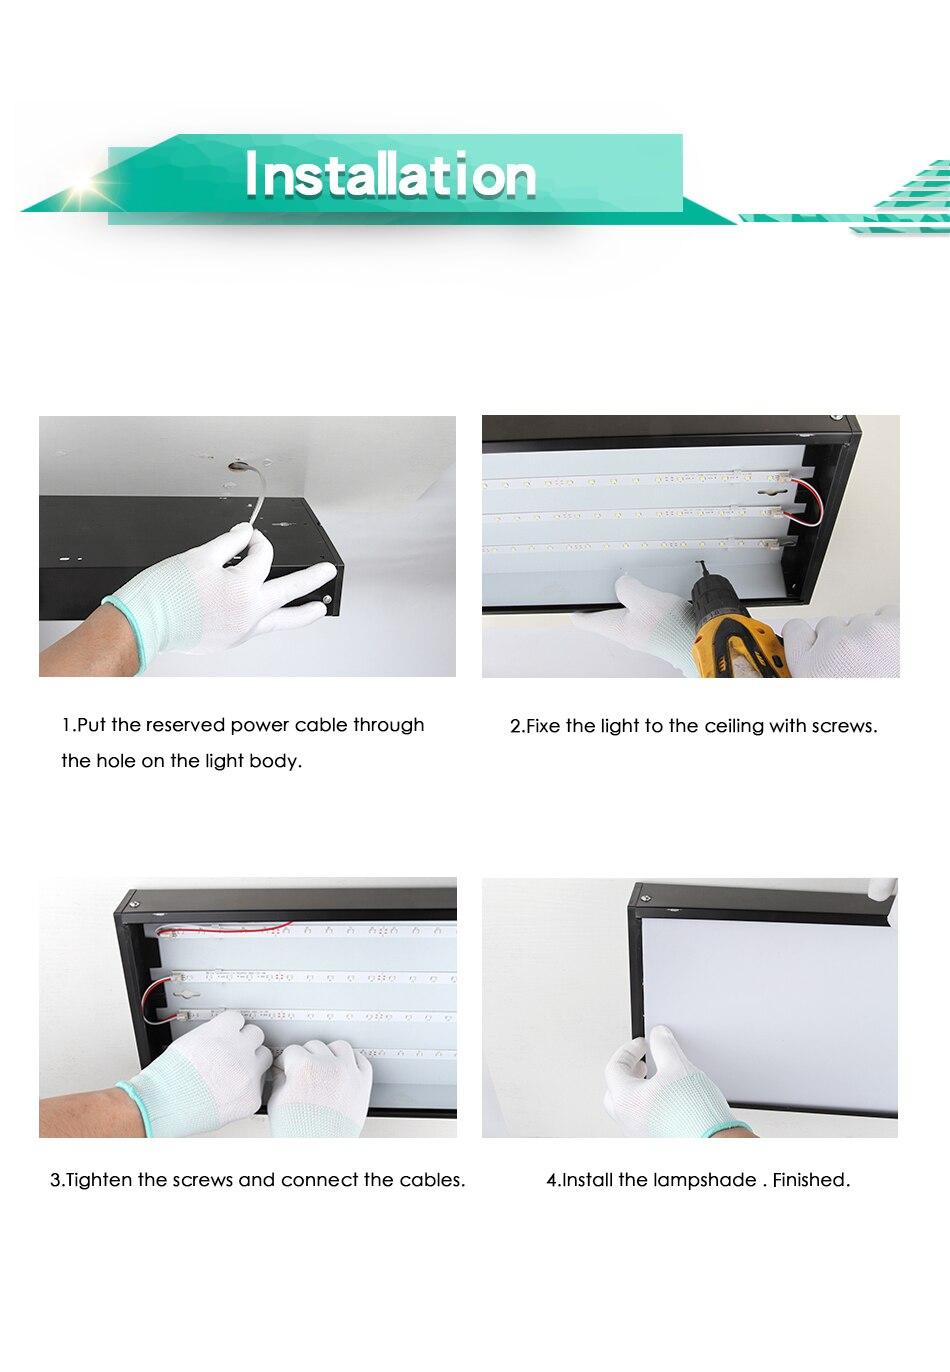 H054bc3dc18bc4e0194a15a853ee5f29d7 Modern LED Ceiling Light Lamp Lighting Fixture Rectangle Office Remote Bedroom Surface Mount Living Room Panel Control 110V 220V